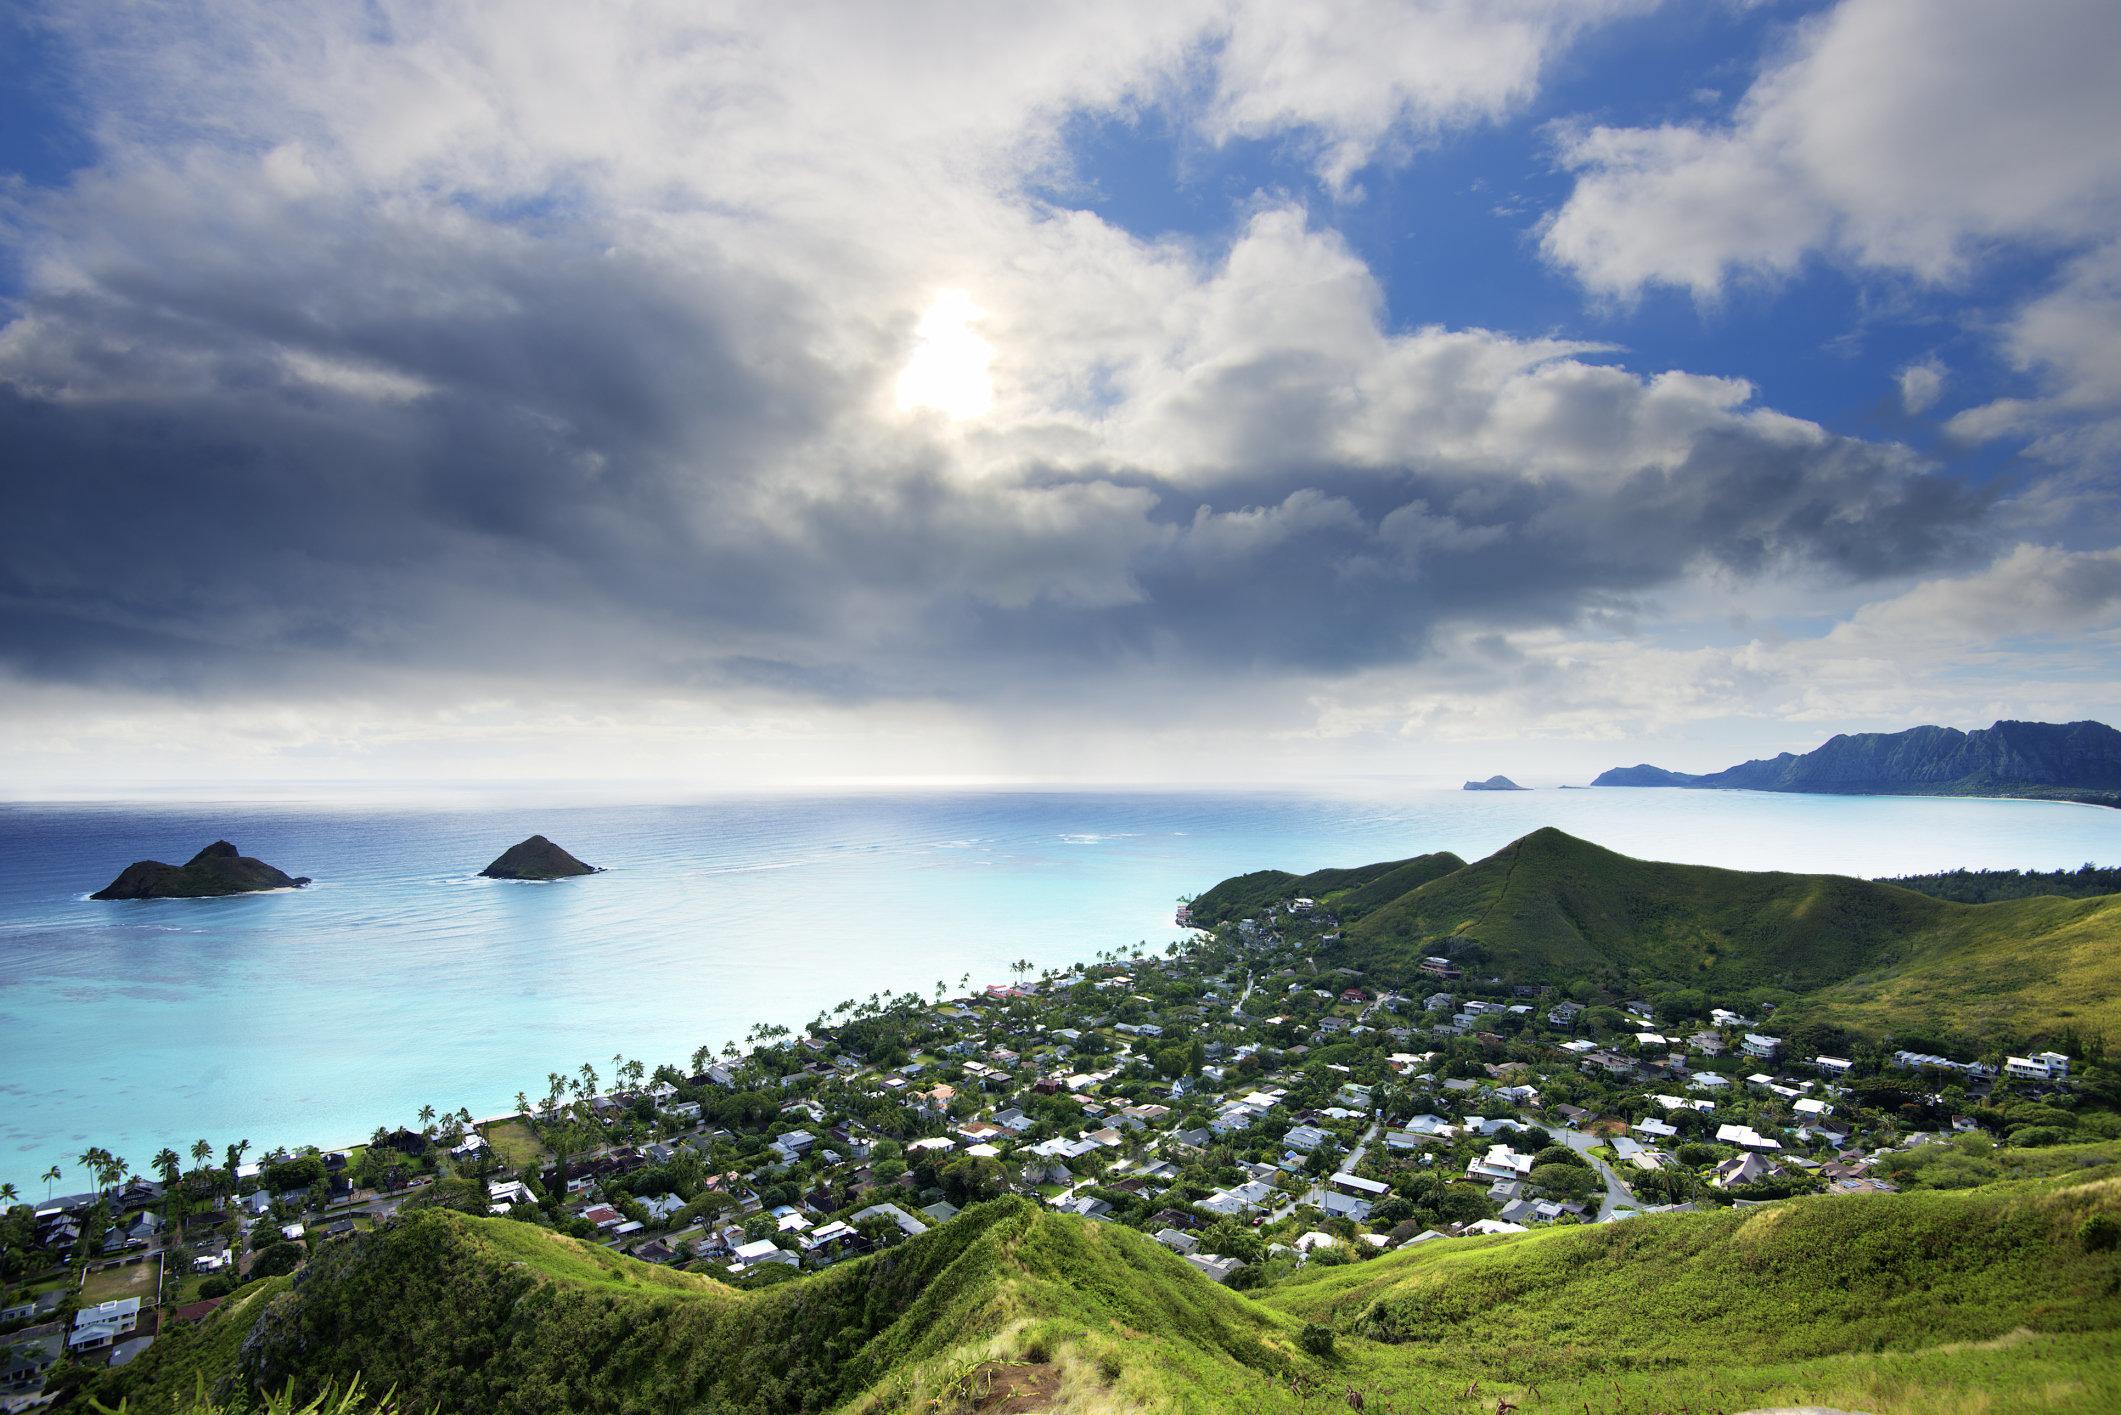 Lanikai Beach, Lanikai Pillbox Trail, Kailua, Oahu, HawaiiAlso in the picture - Mokulua Islands (twin islands)